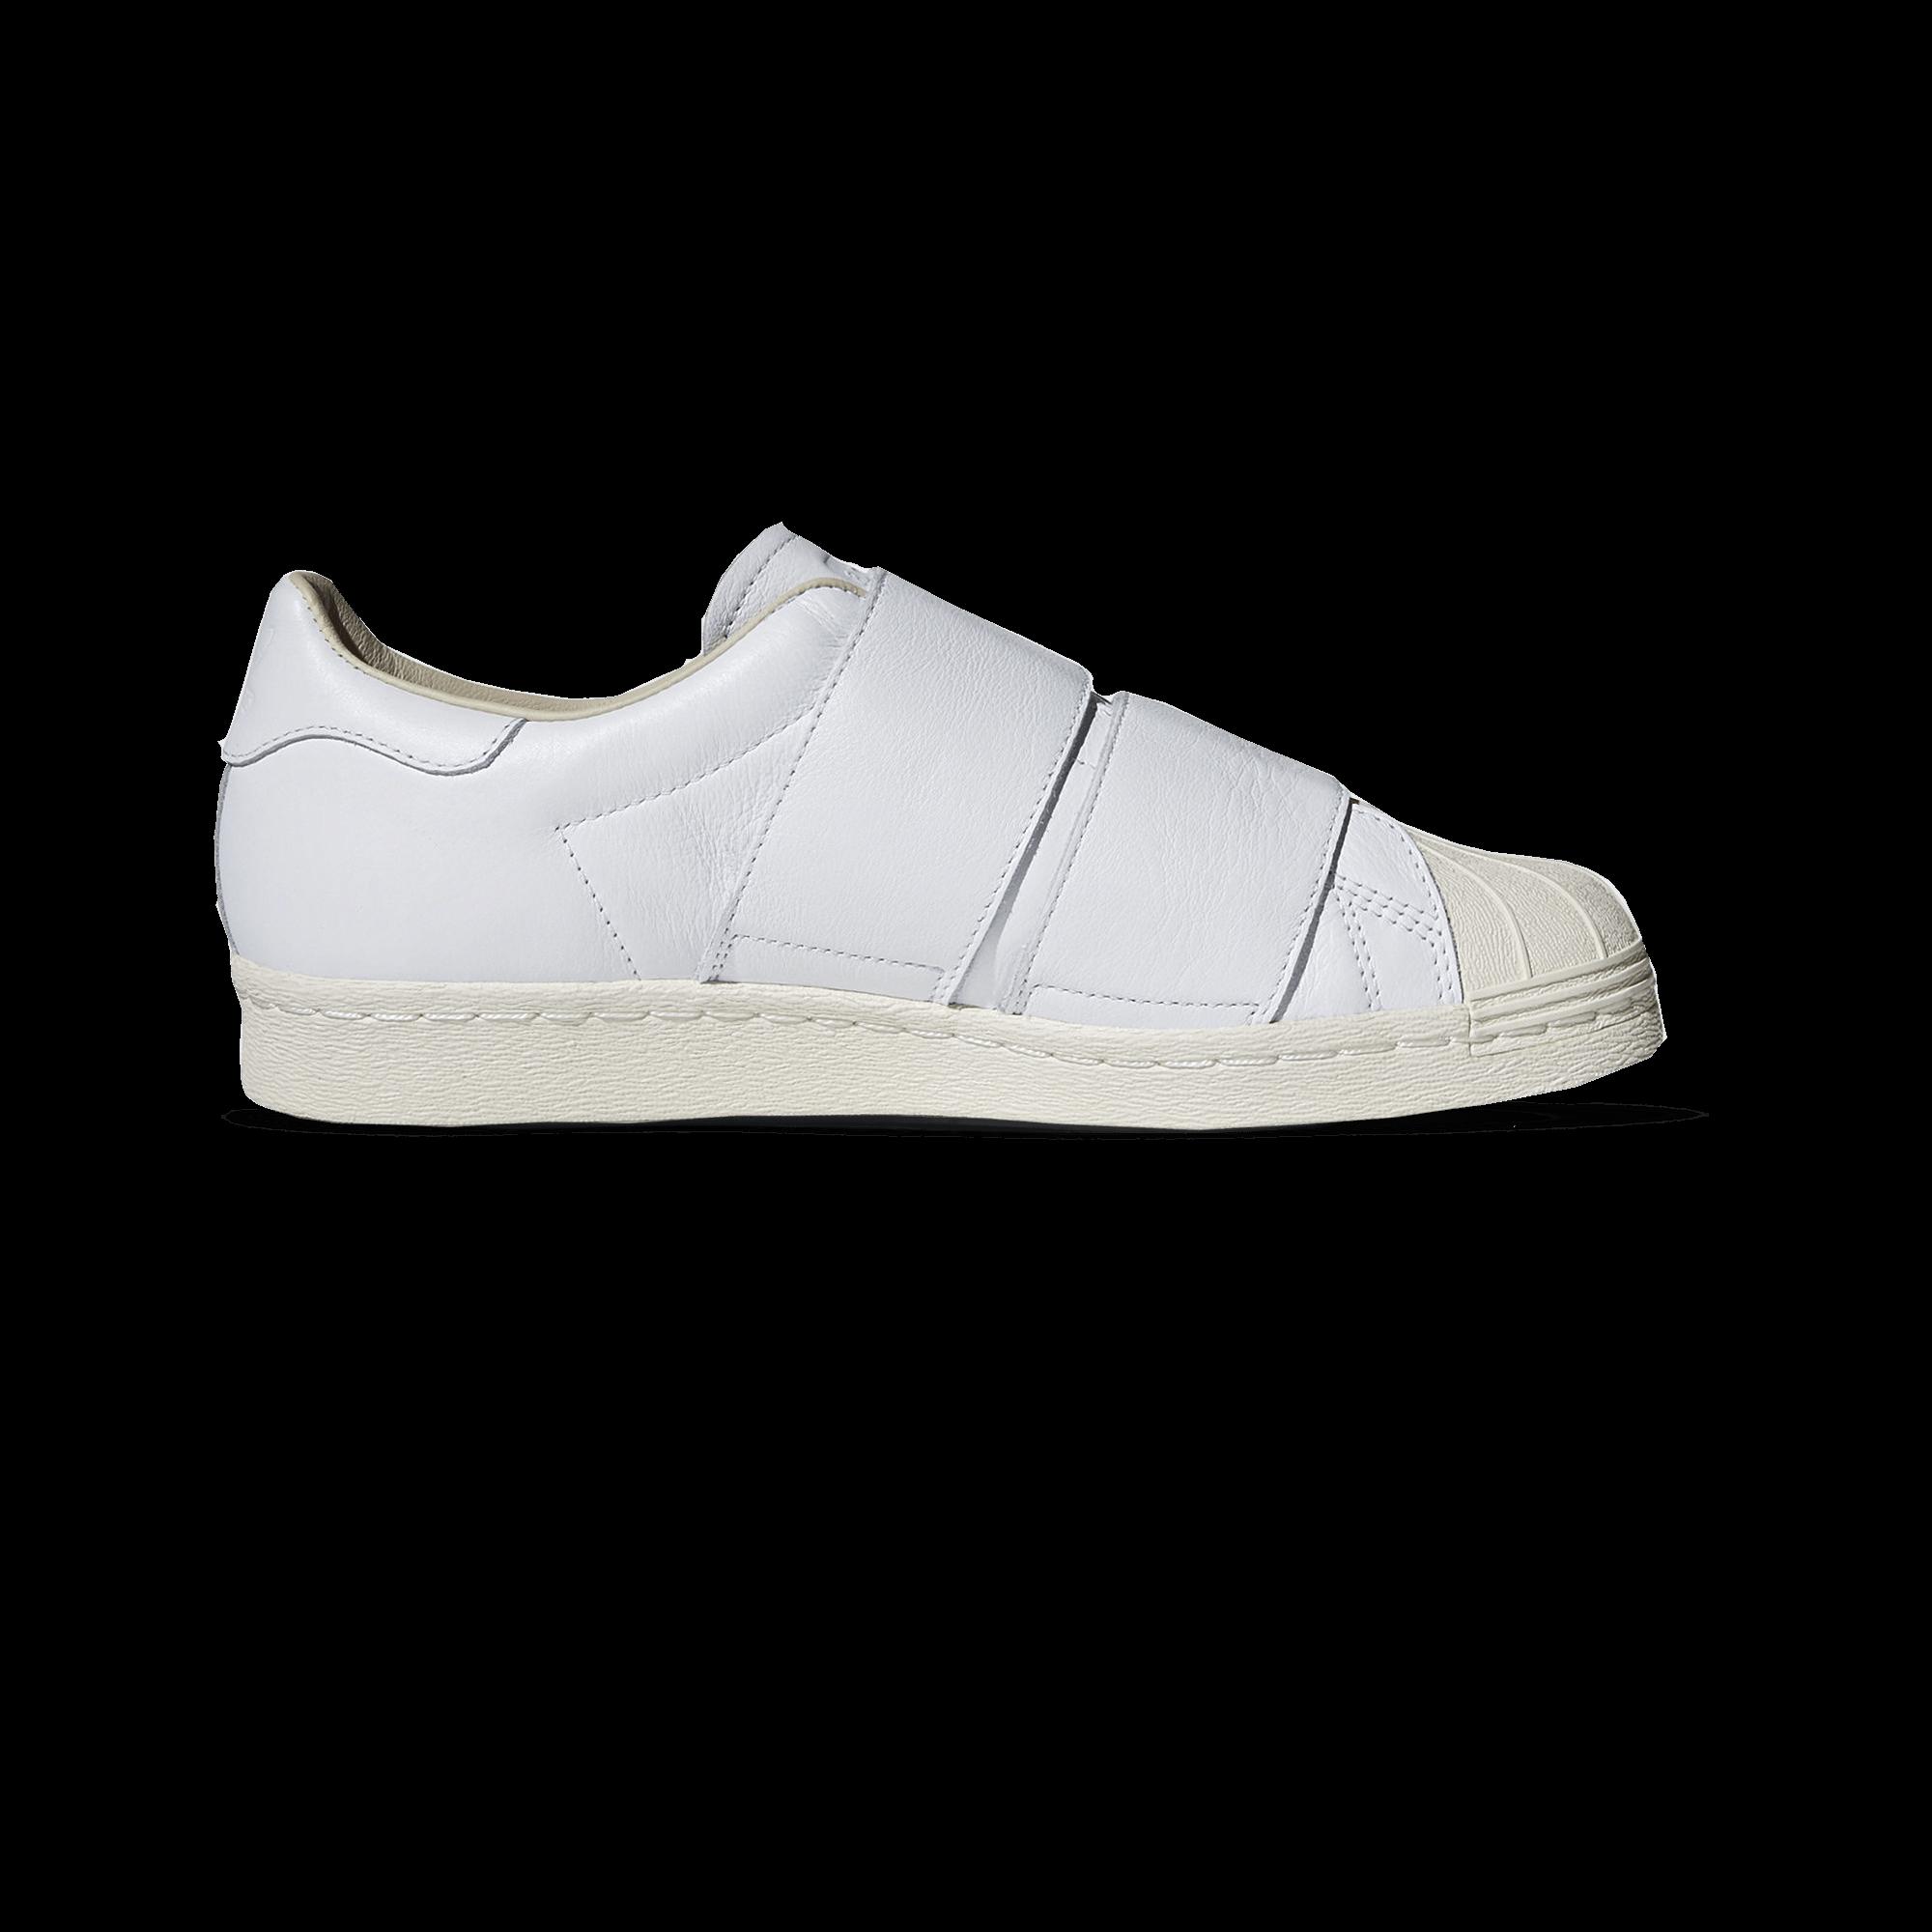 Adidas Superstar 80 'Di Bianco / Donna Bianca